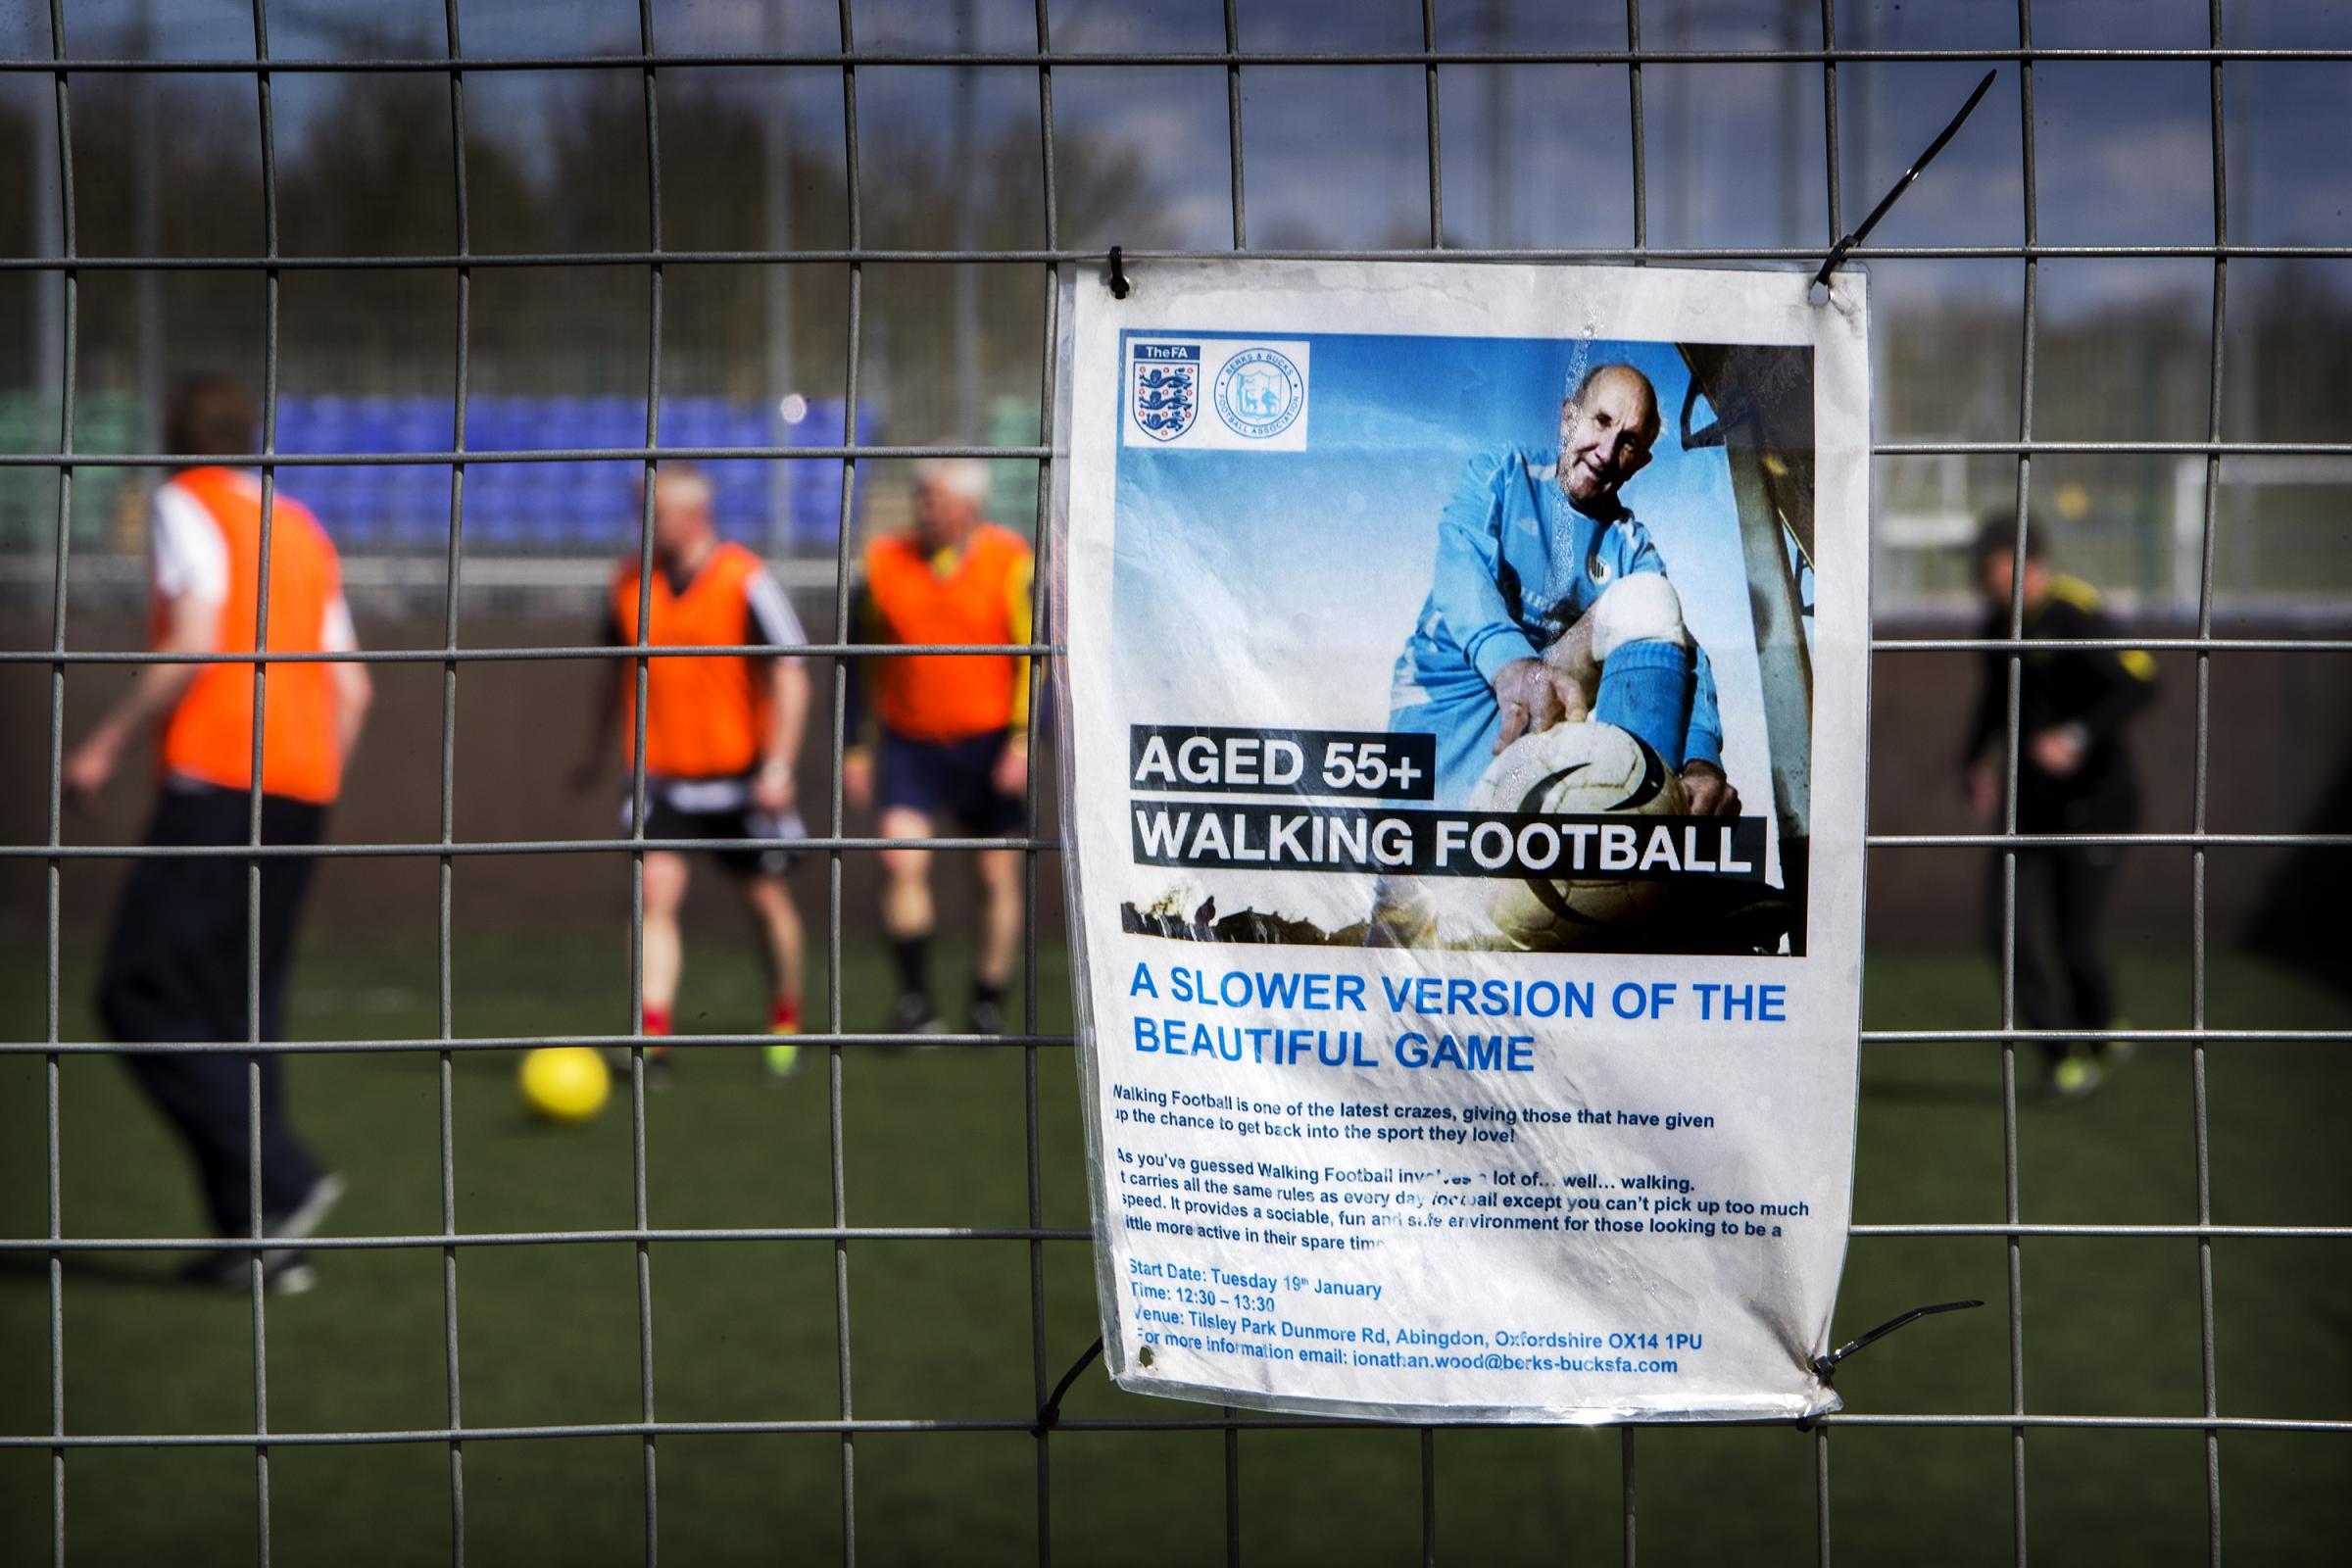 Abingdon speed dating, sex release gallery